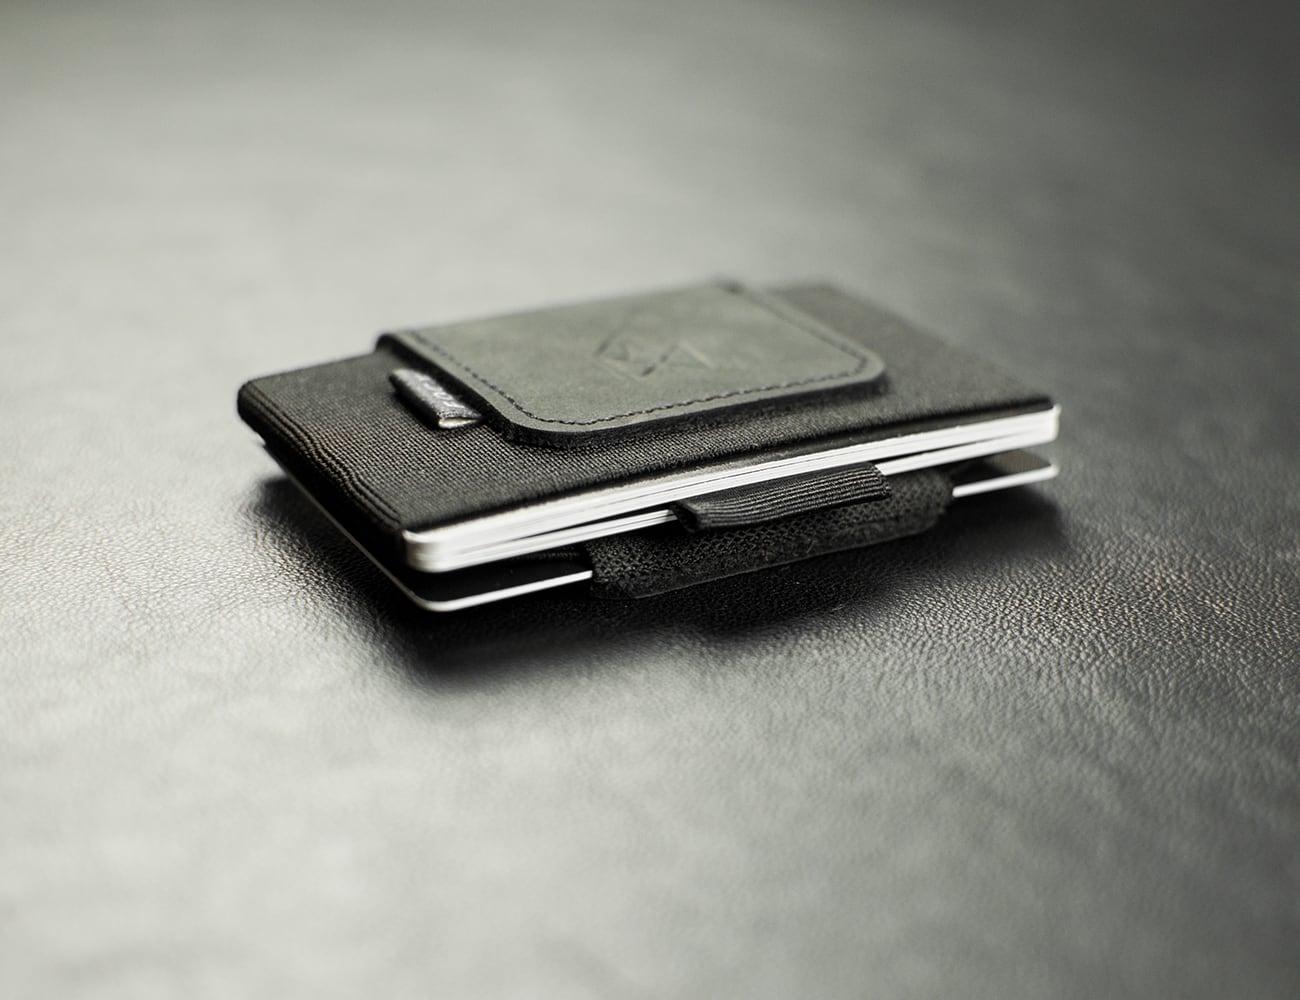 focx compact everyday smart wallet gadget flow